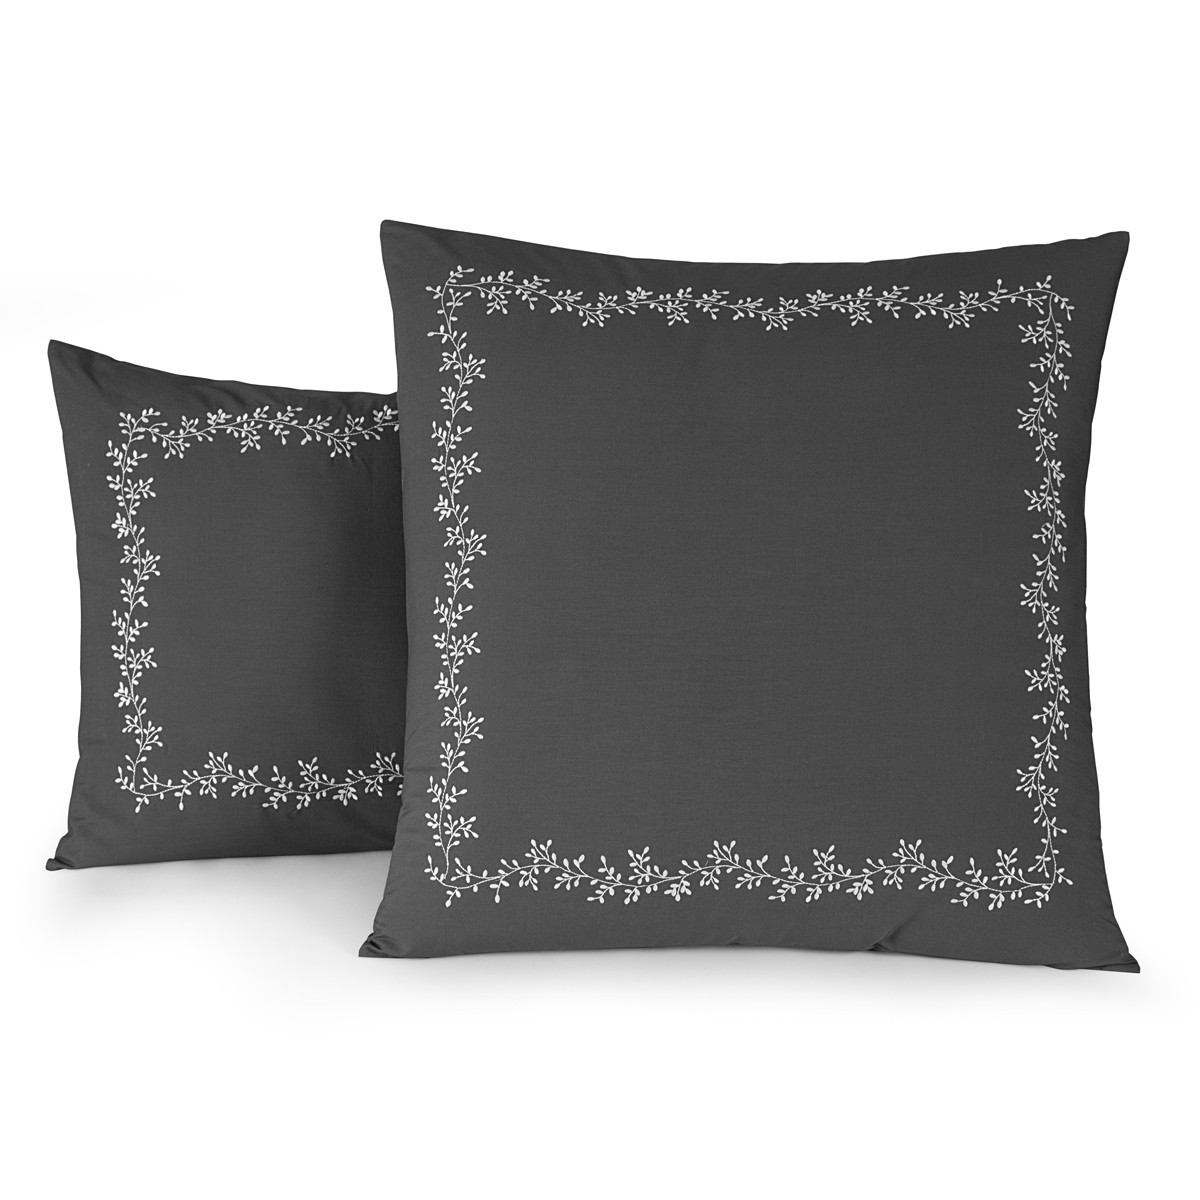 oreiller reverie Taie Oreiller Reverie | Soldes jusqu'à  55% | Linge de lit de  oreiller reverie